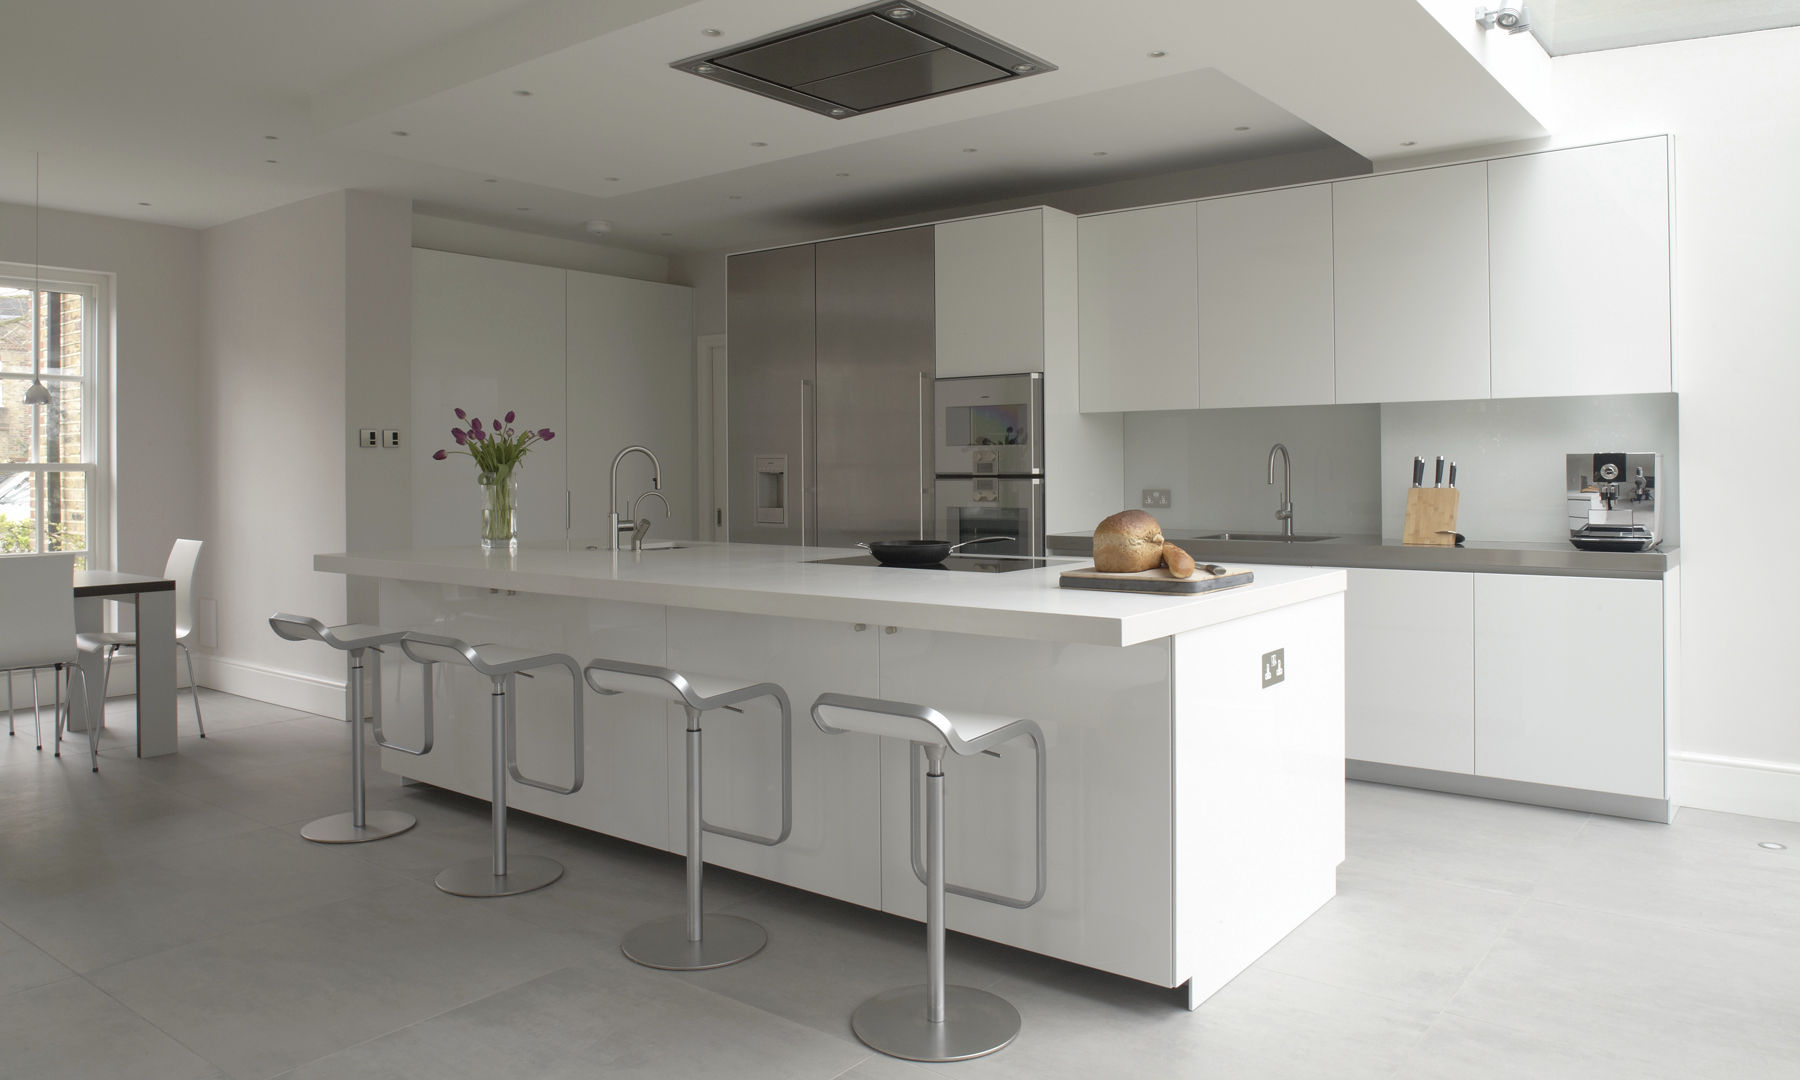 Cocina moderna / de acero inoxidable / de material laminado / con ...